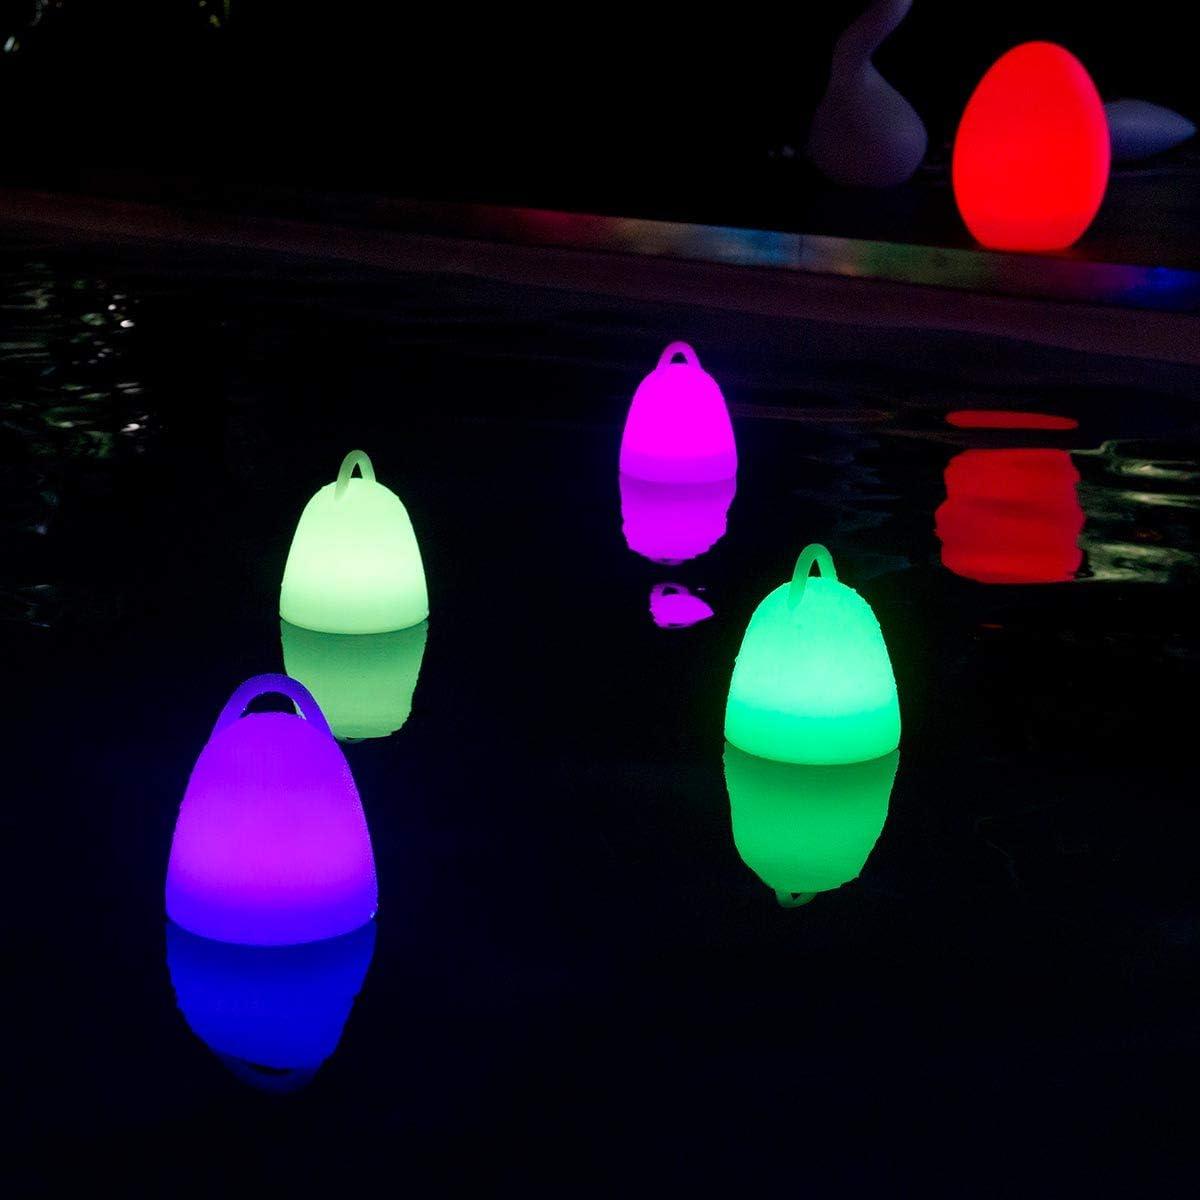 5W 5V Remote Control Multicolour Energy class A ++ Lumisky PBB1560 LED RGB Table Lantern with Handle